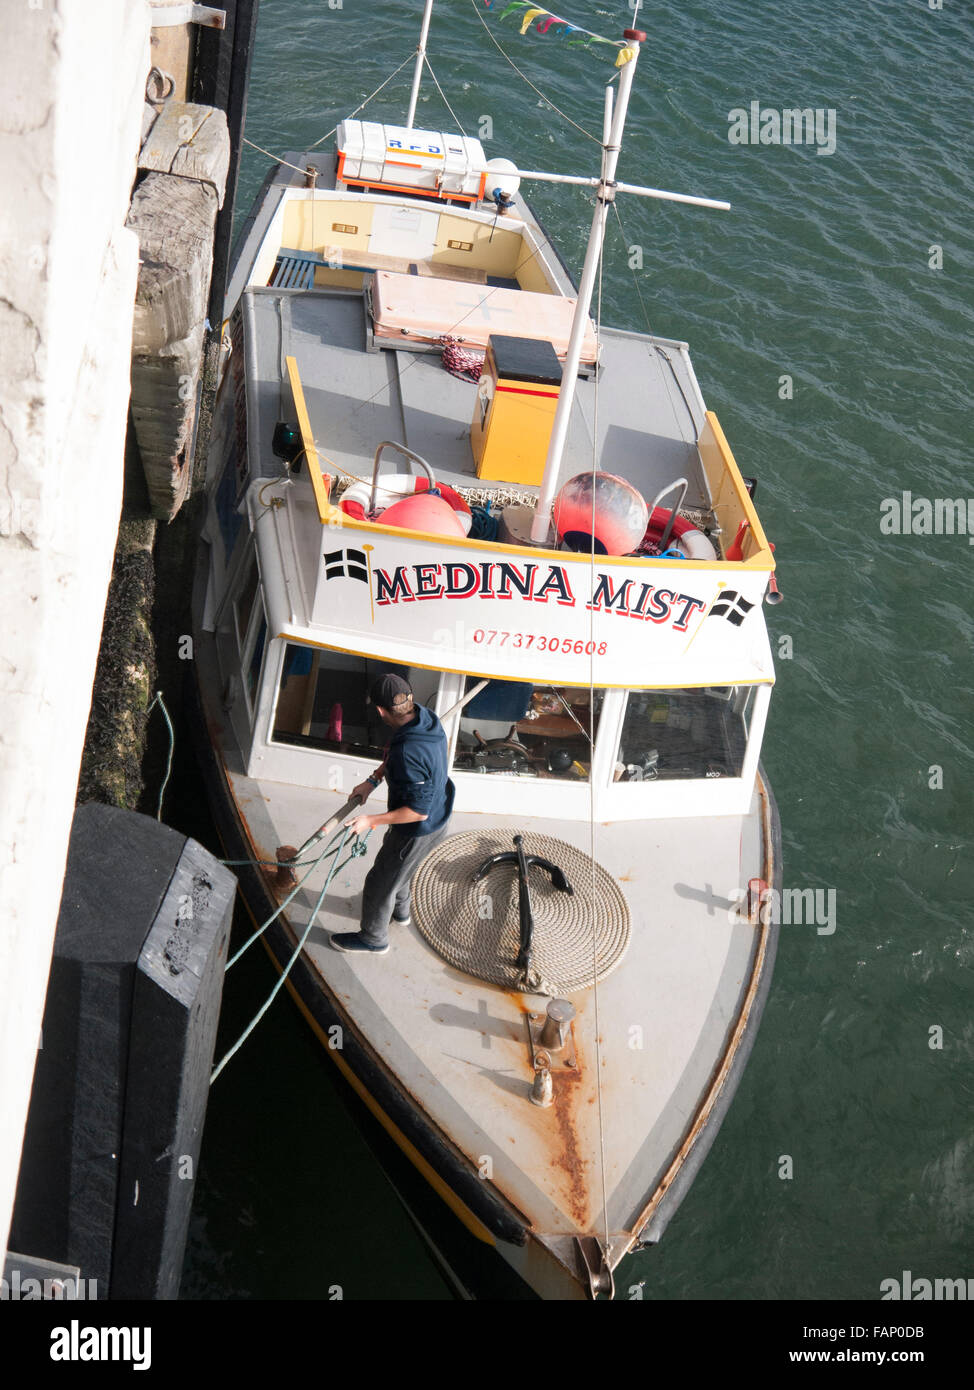 Sightseeing pleasure cruise, boat trip, Medina Mist, Falmouth harbour